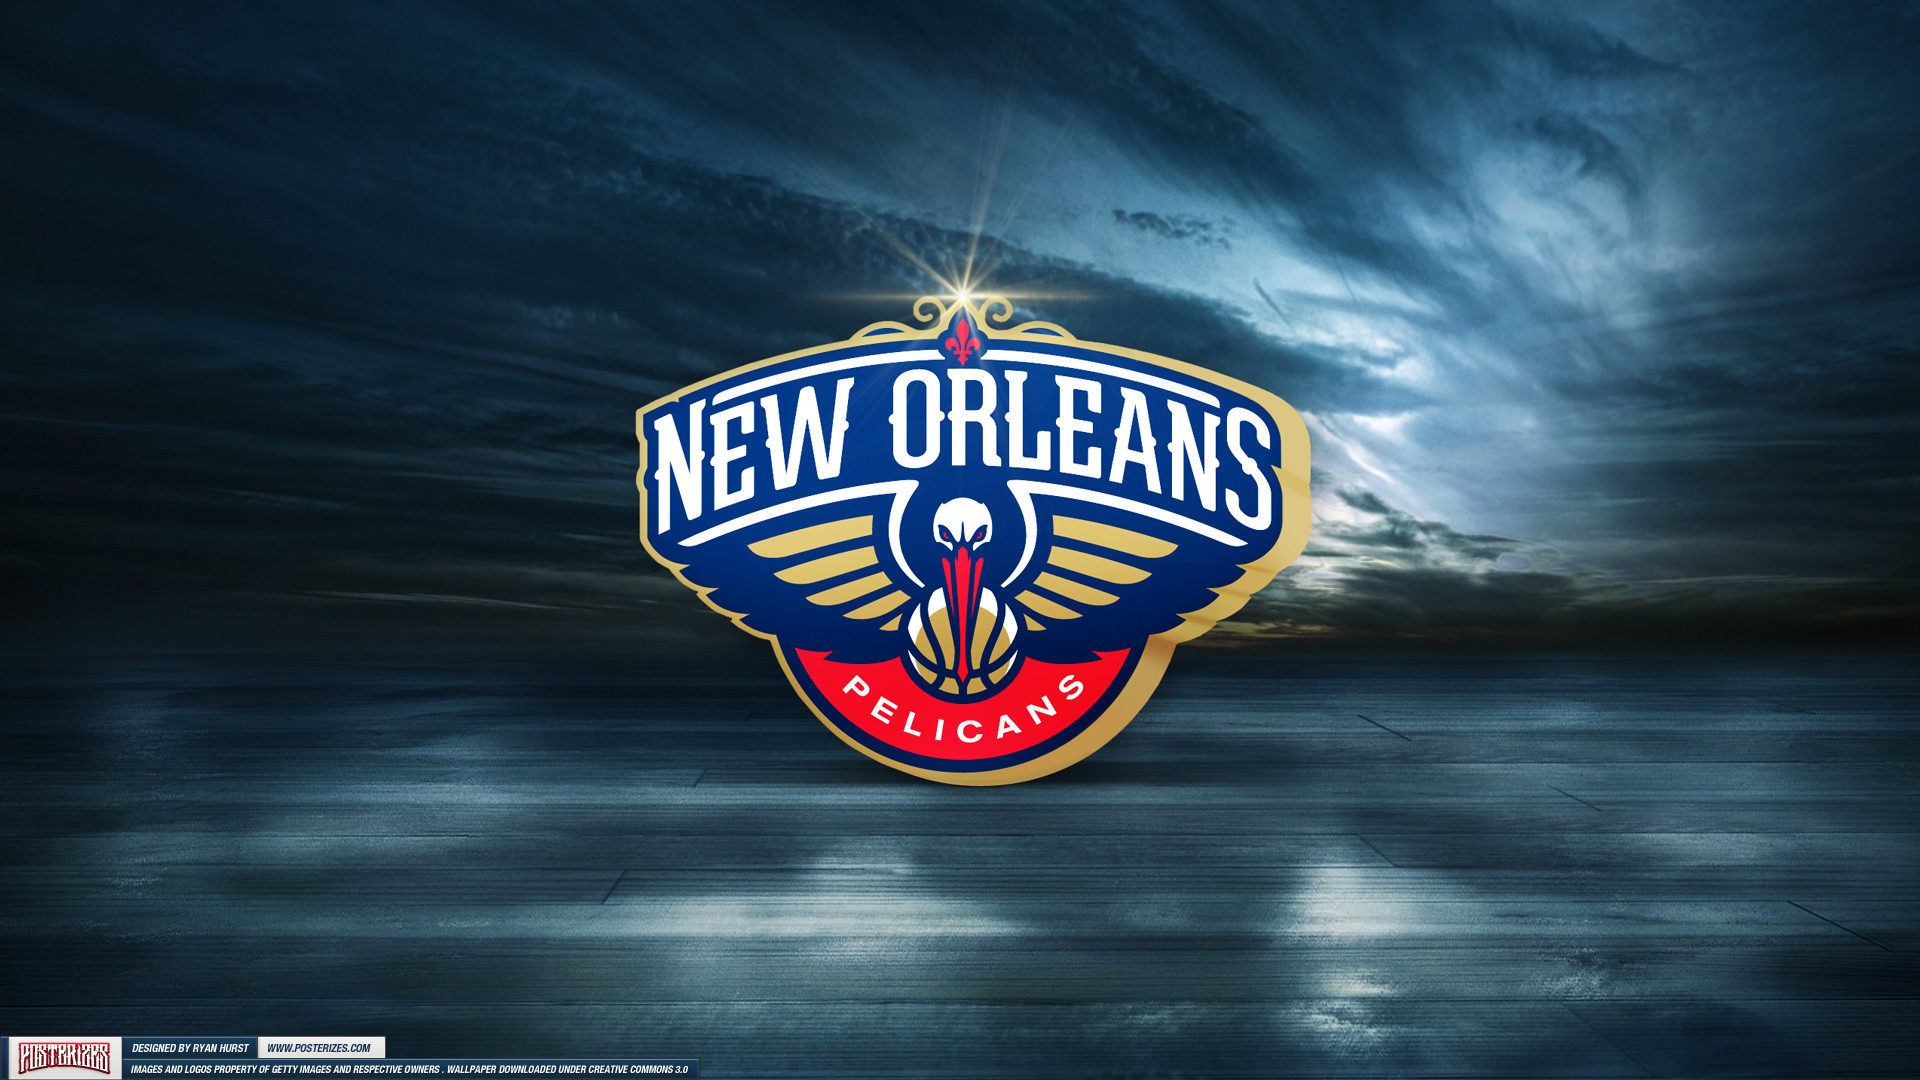 New Orleans Pelicans Wallpaper #1   New Orleans Hornets/Pelicans    Pinterest   NBA